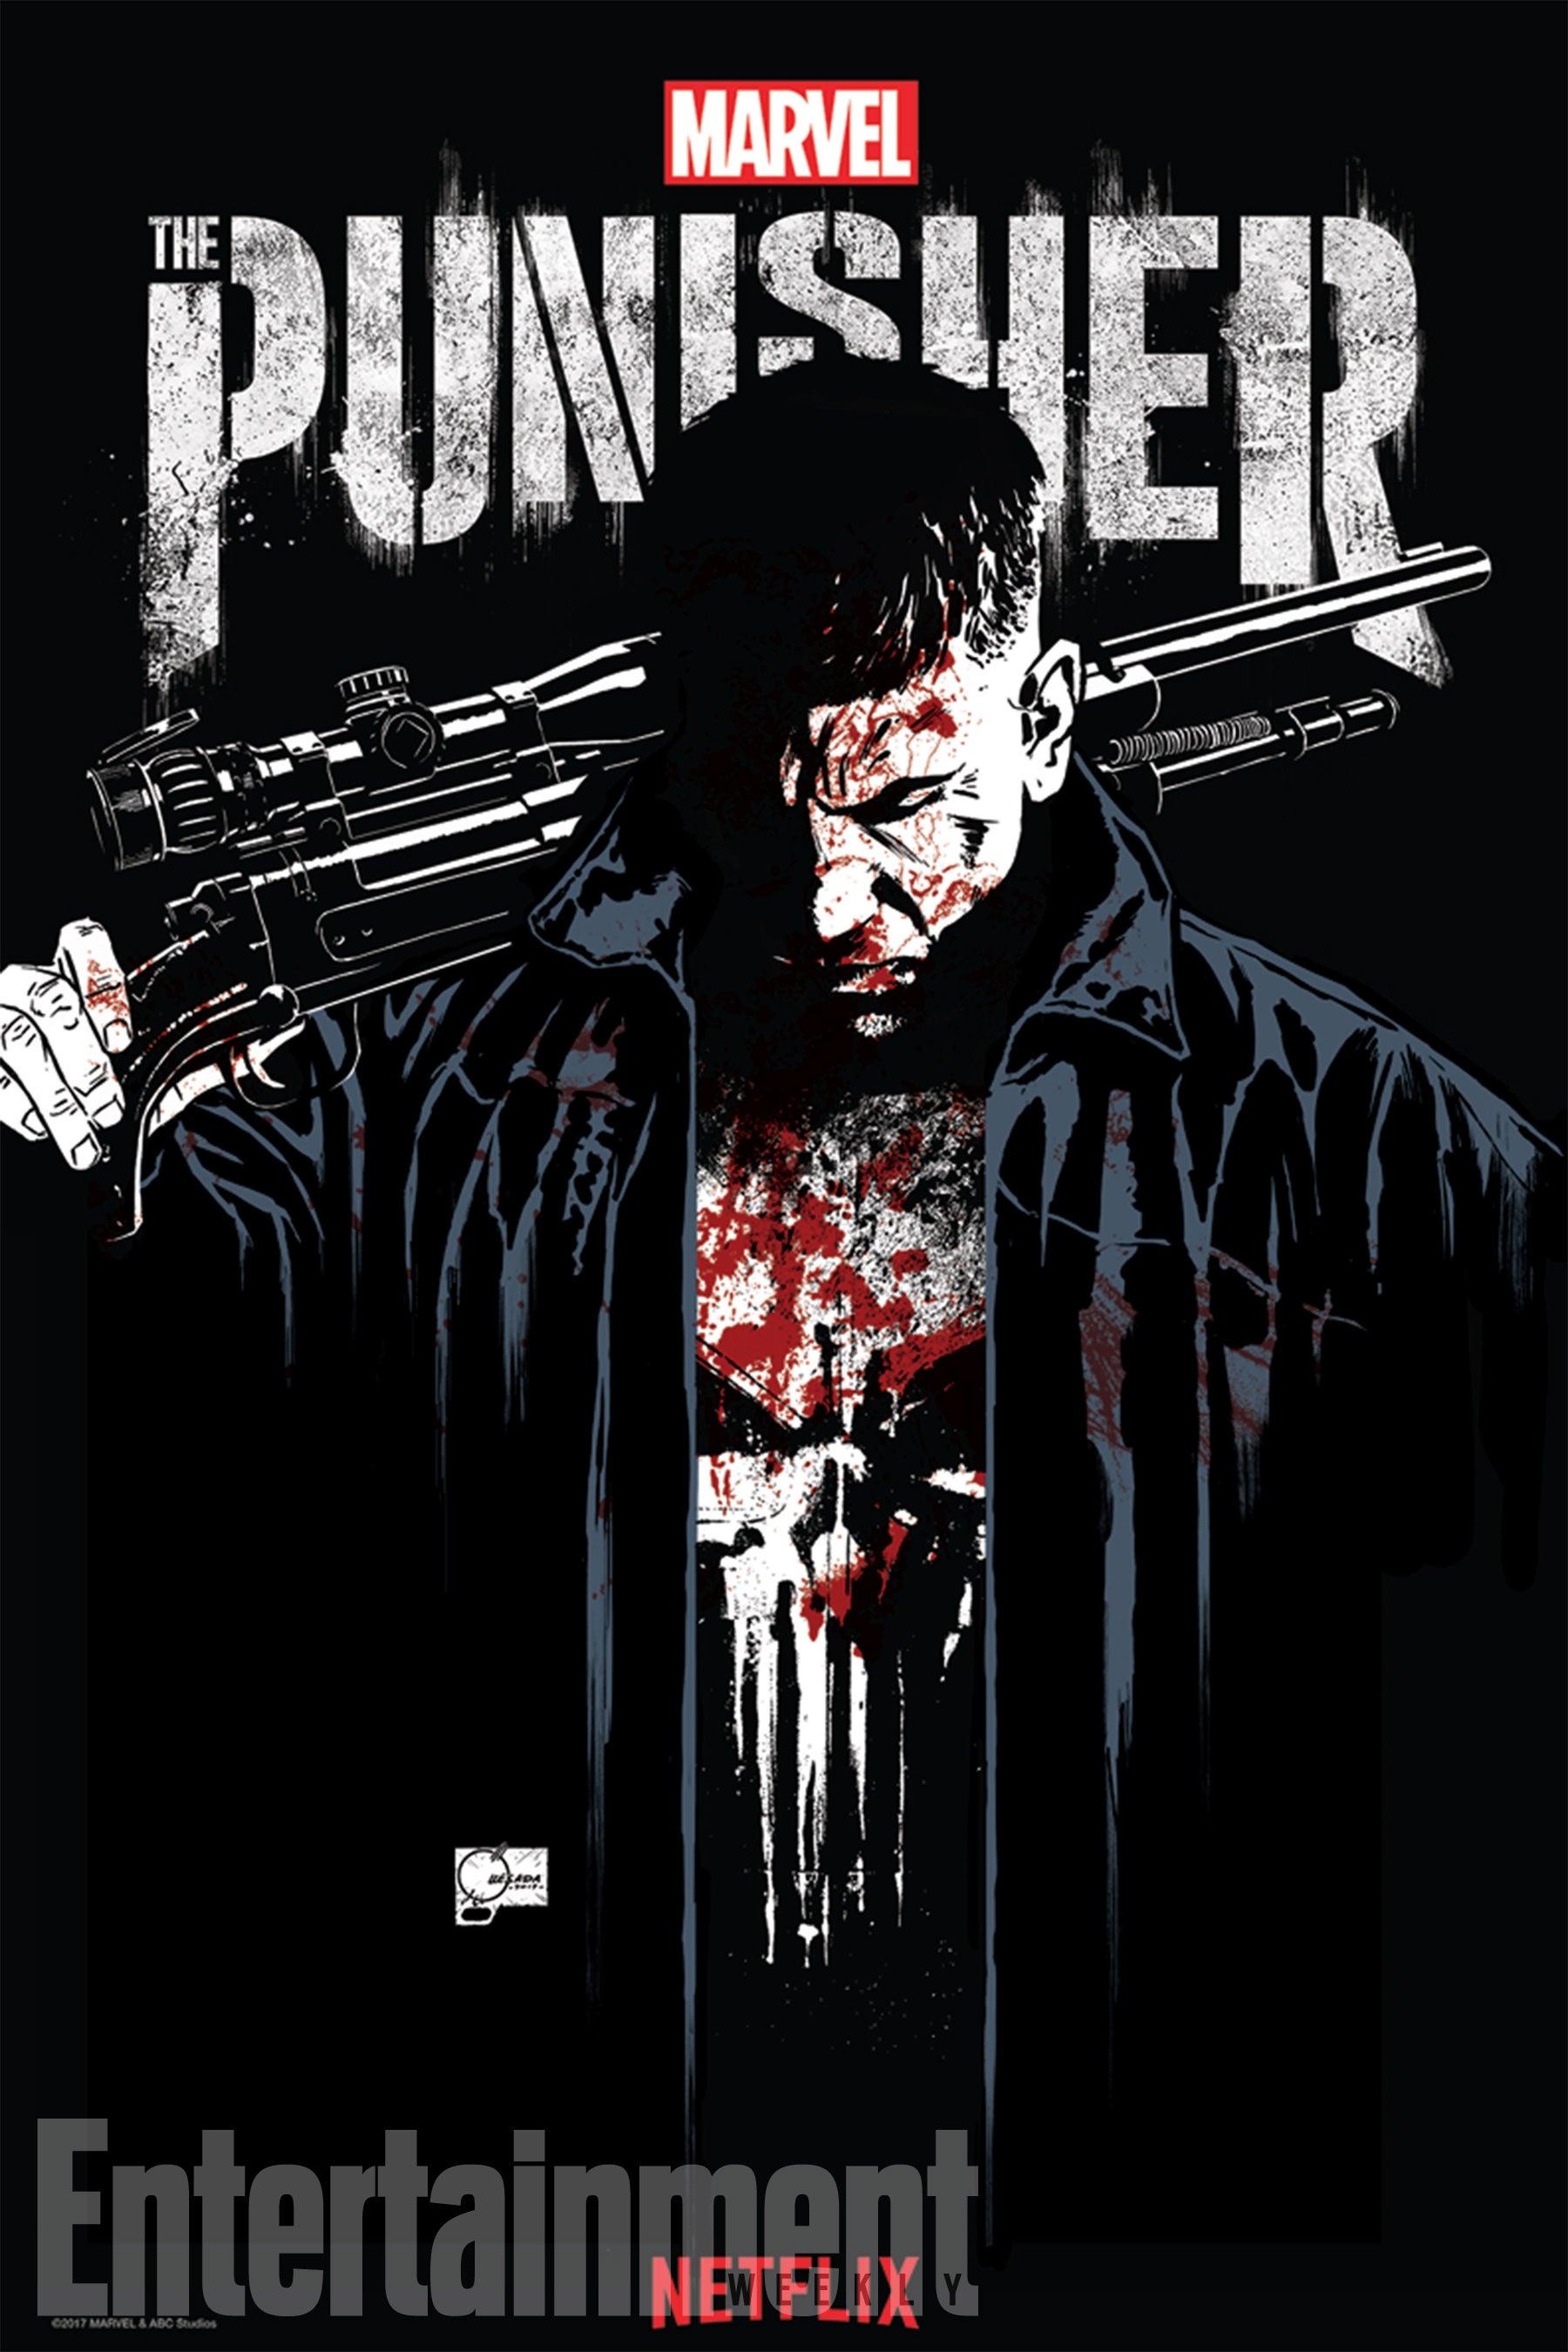 Cartaz da série Justiceiro / Punisher, da Netflix